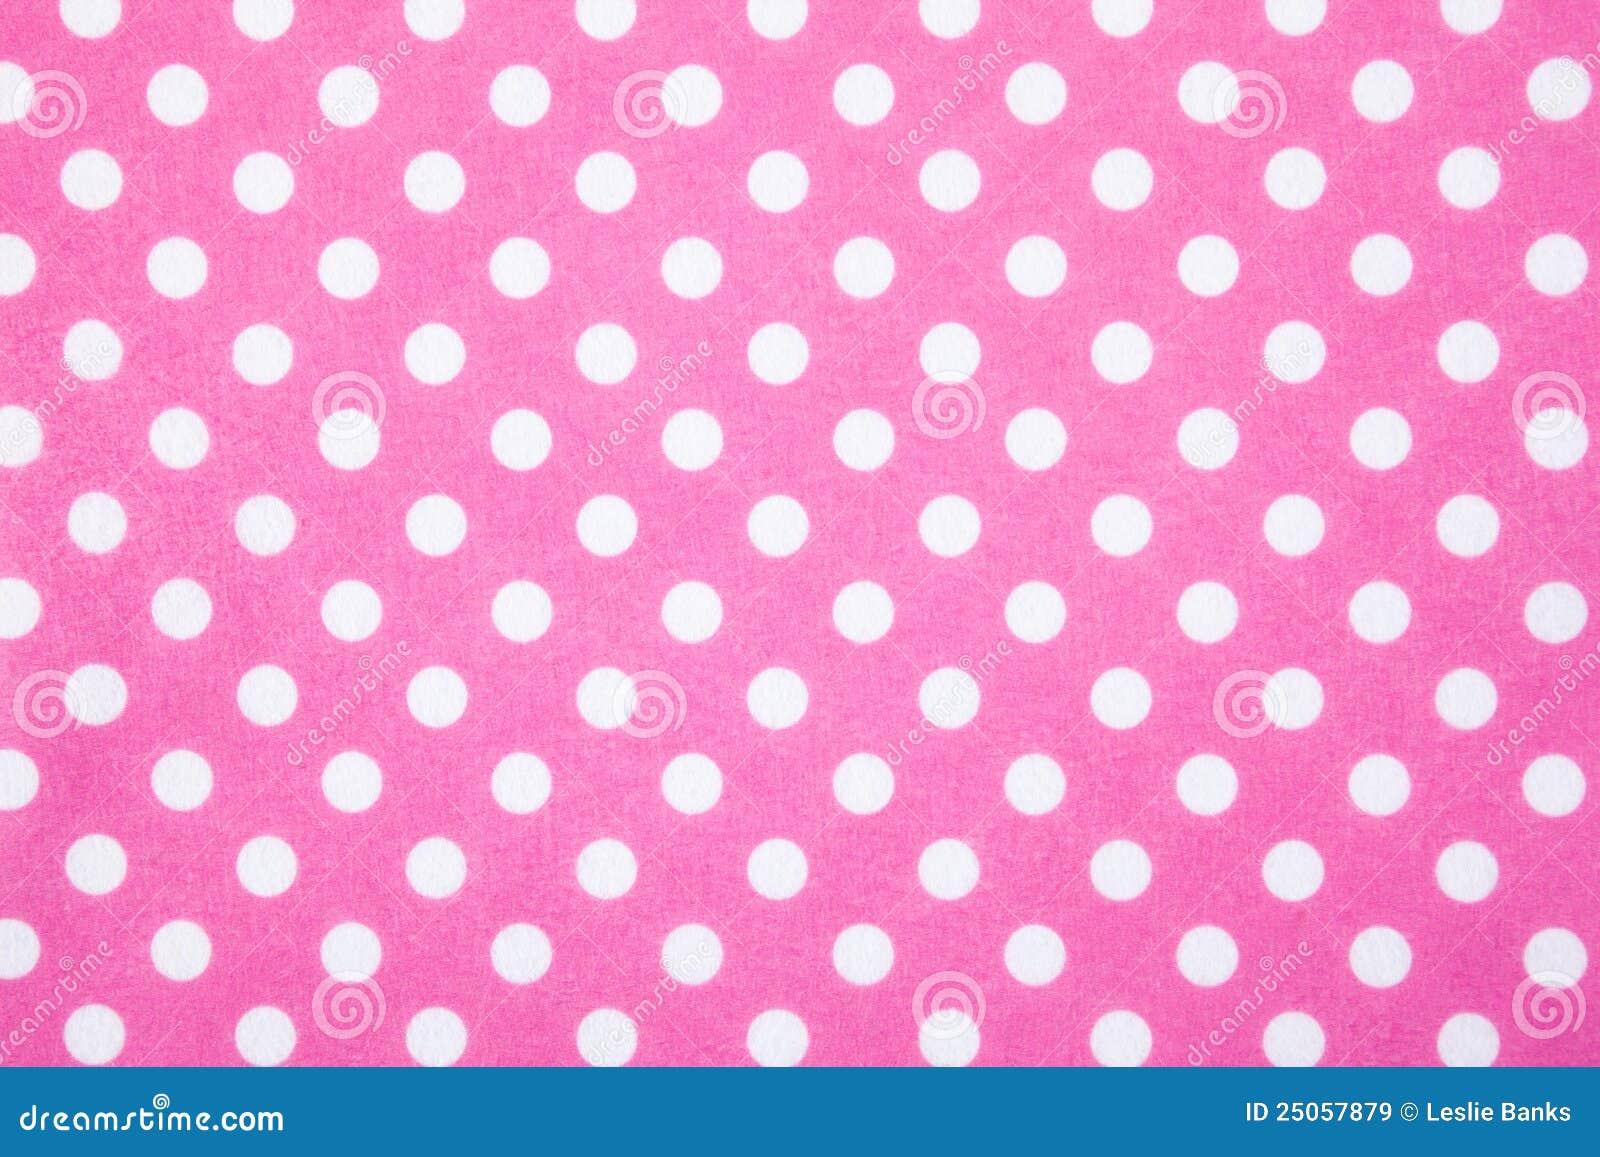 Pink Felt Polka Dot Background Stock Image